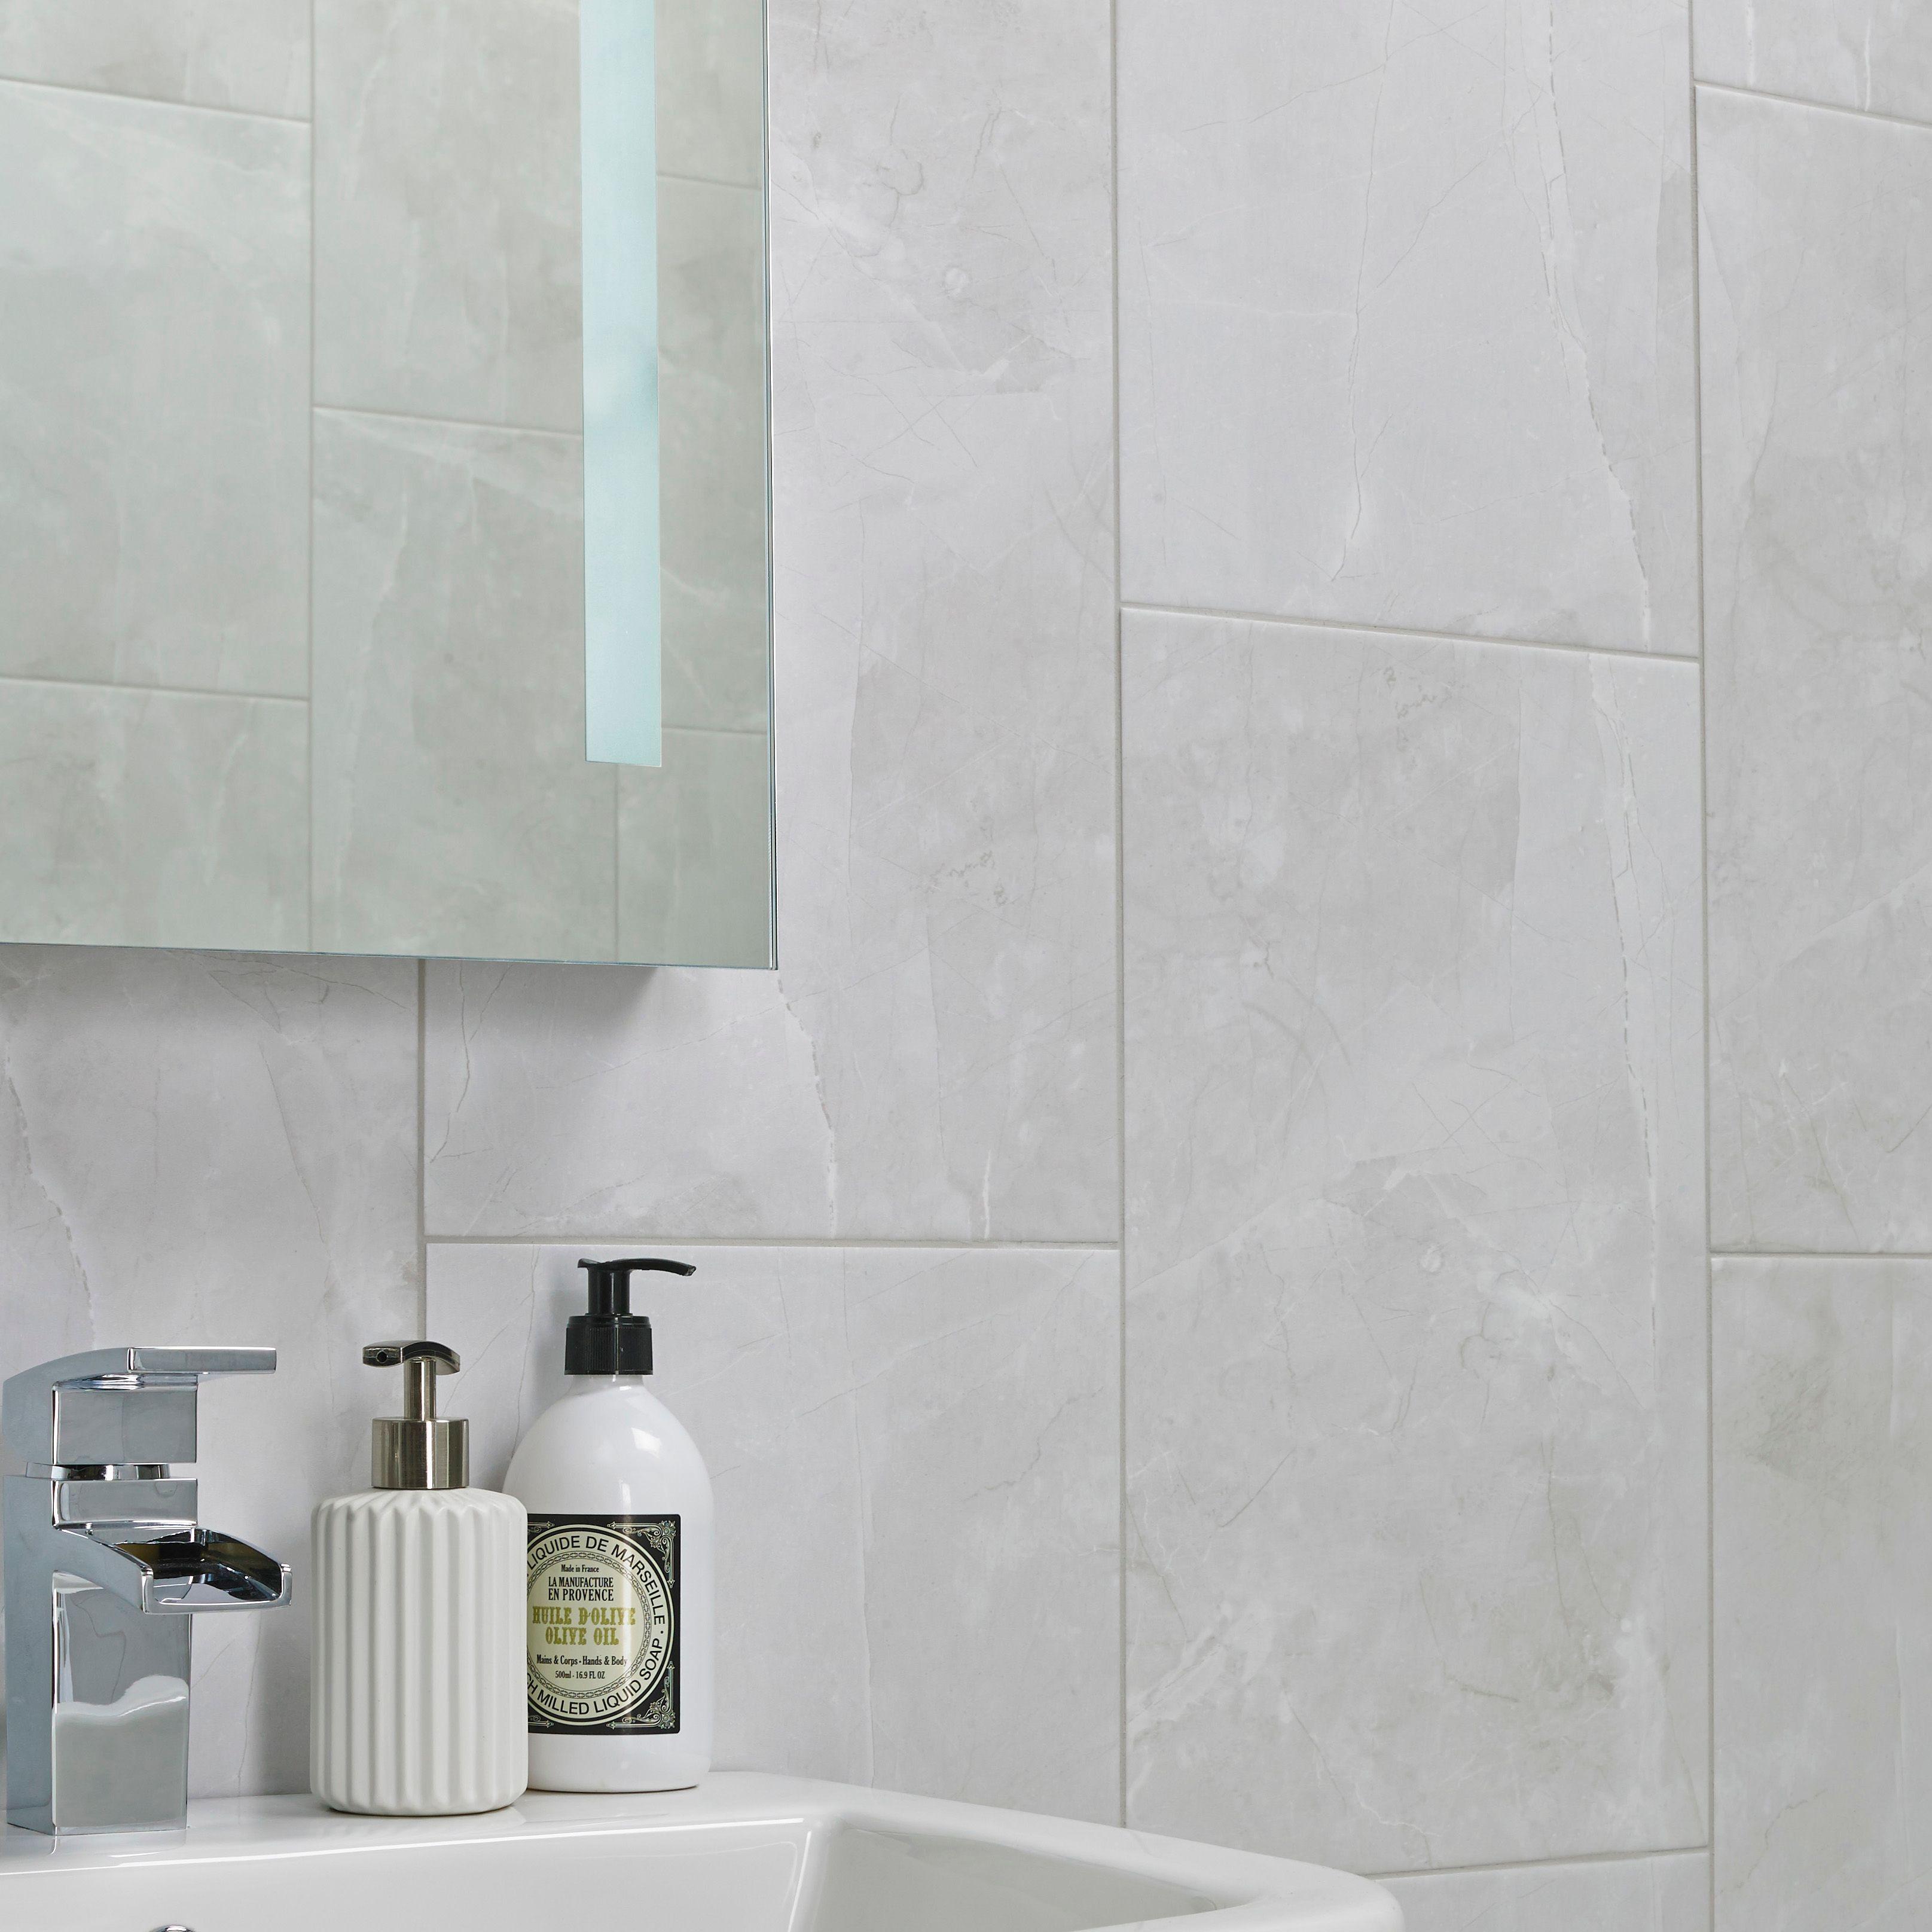 B q bathroom scales - Arlington Marble Mist Stone Effect High Definition Ceramic Wall Floor Tile Pack Of 6